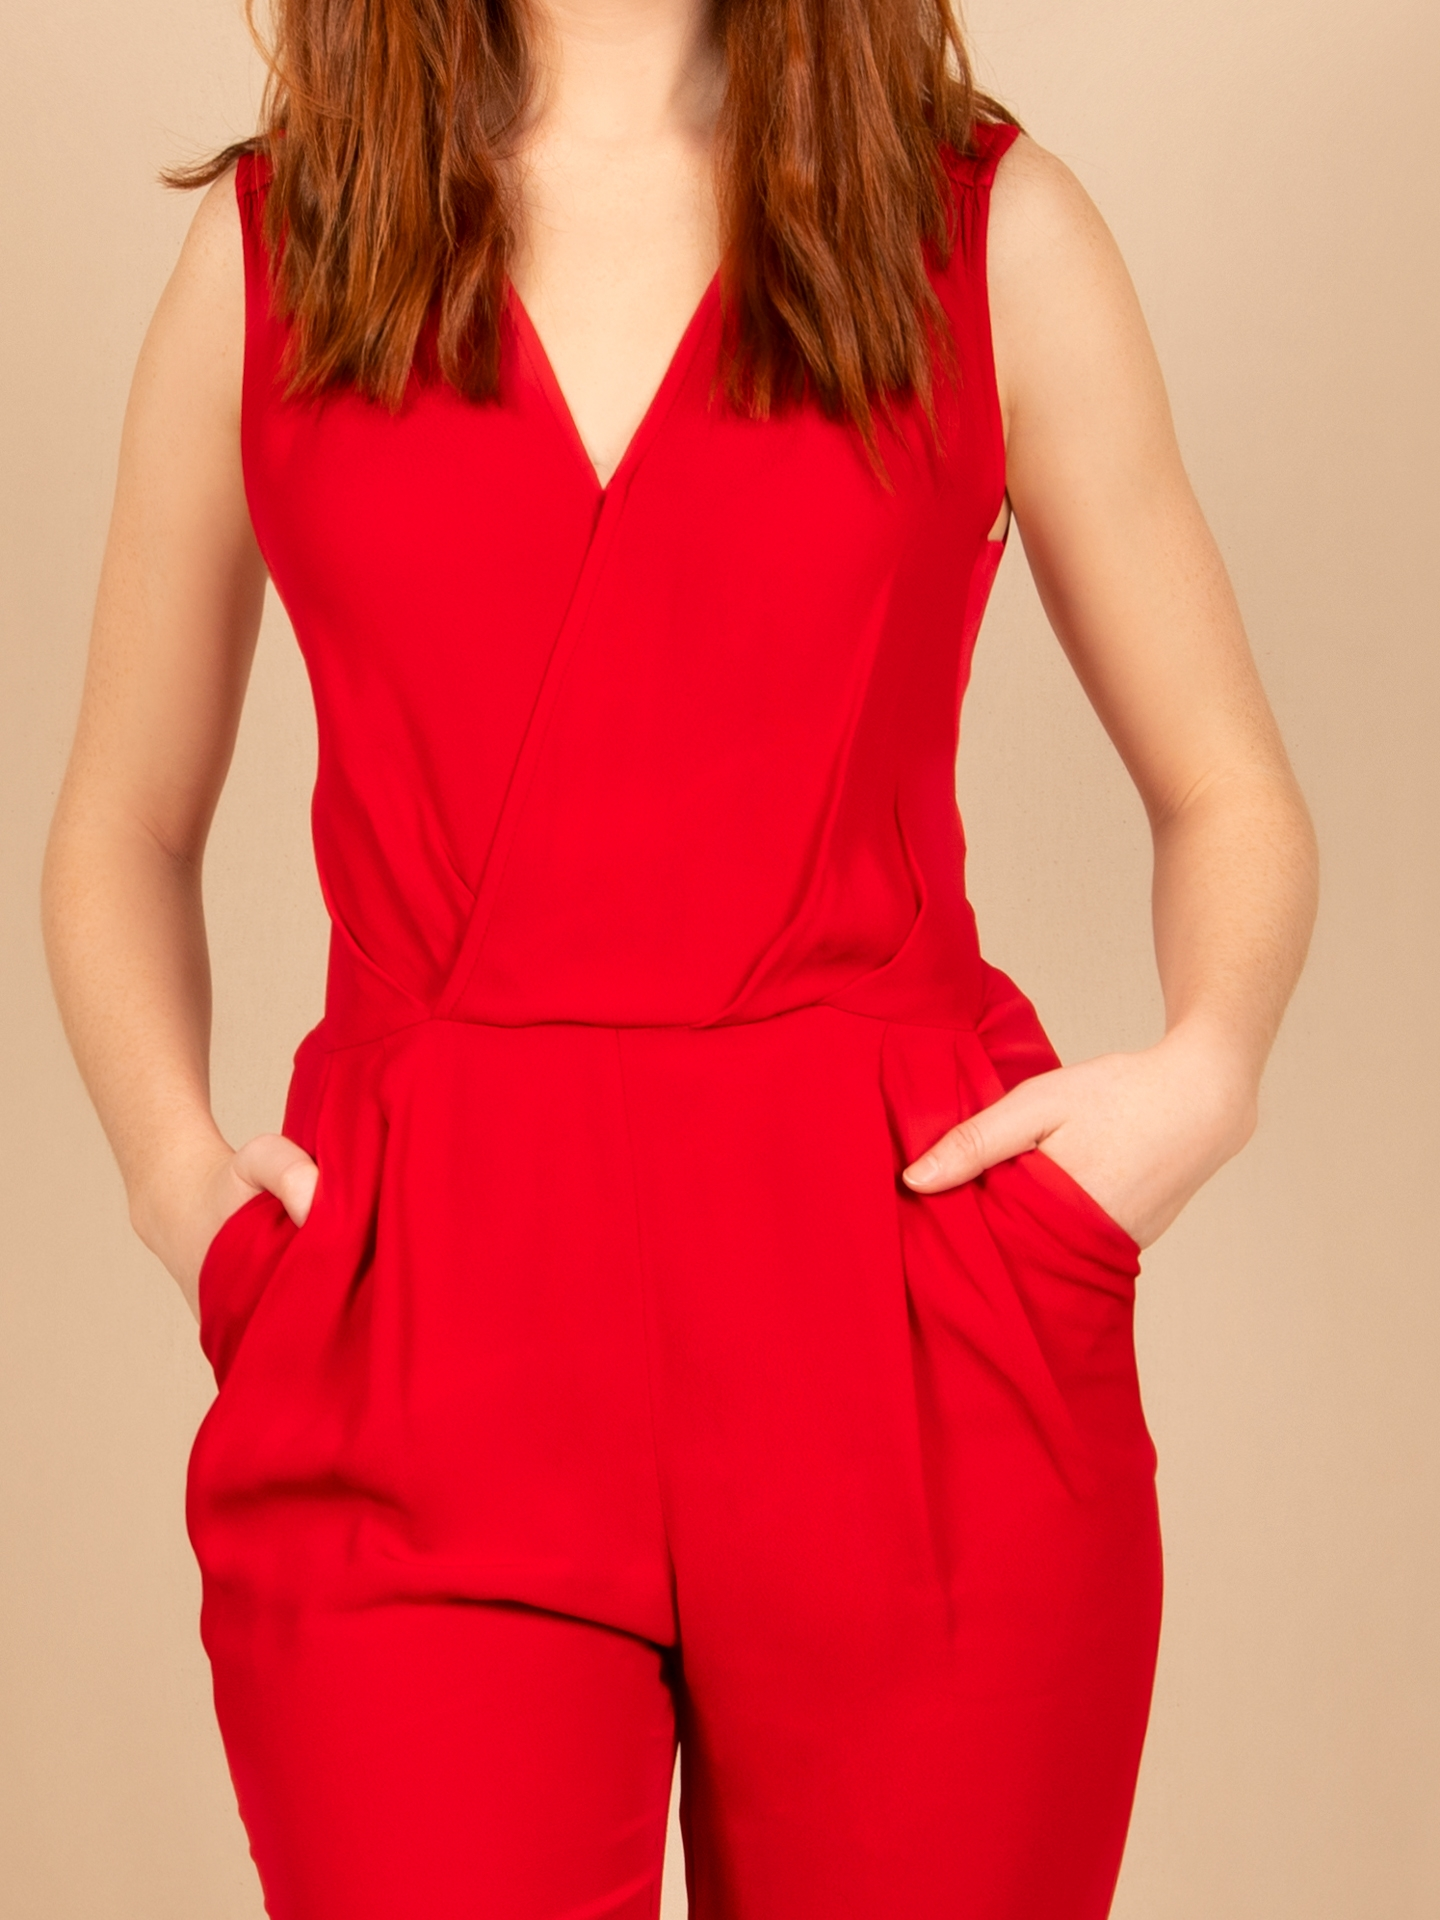 Verone Rouge